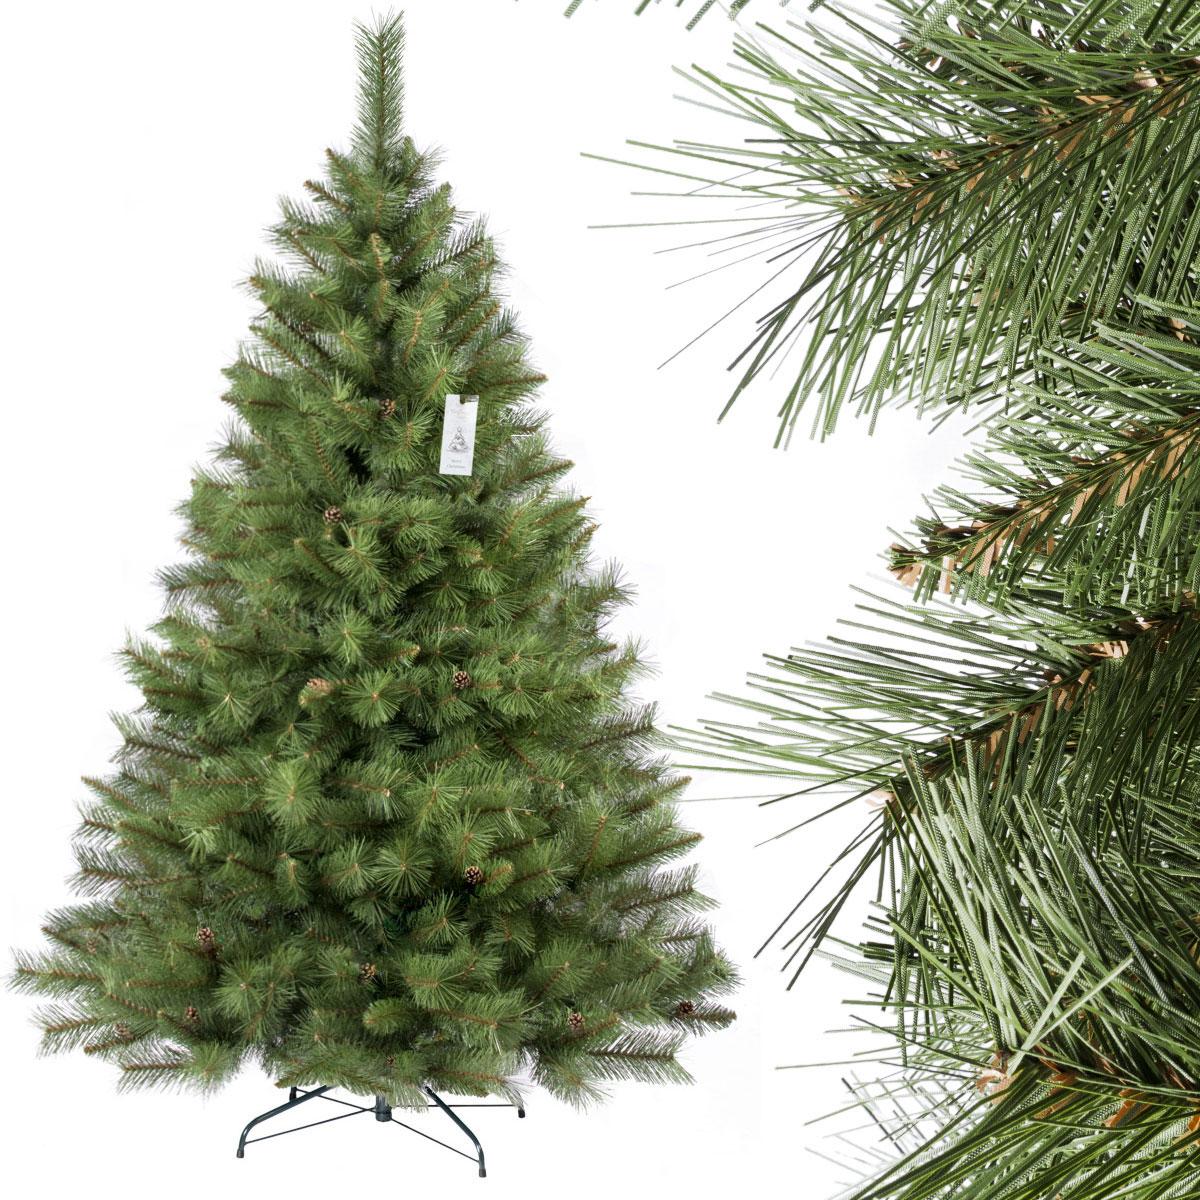 Artificiales de árbol de Navidad Árbol de Navidad tannenbaum LED cadena luces LED tannenbaum Navidad ea3e8d